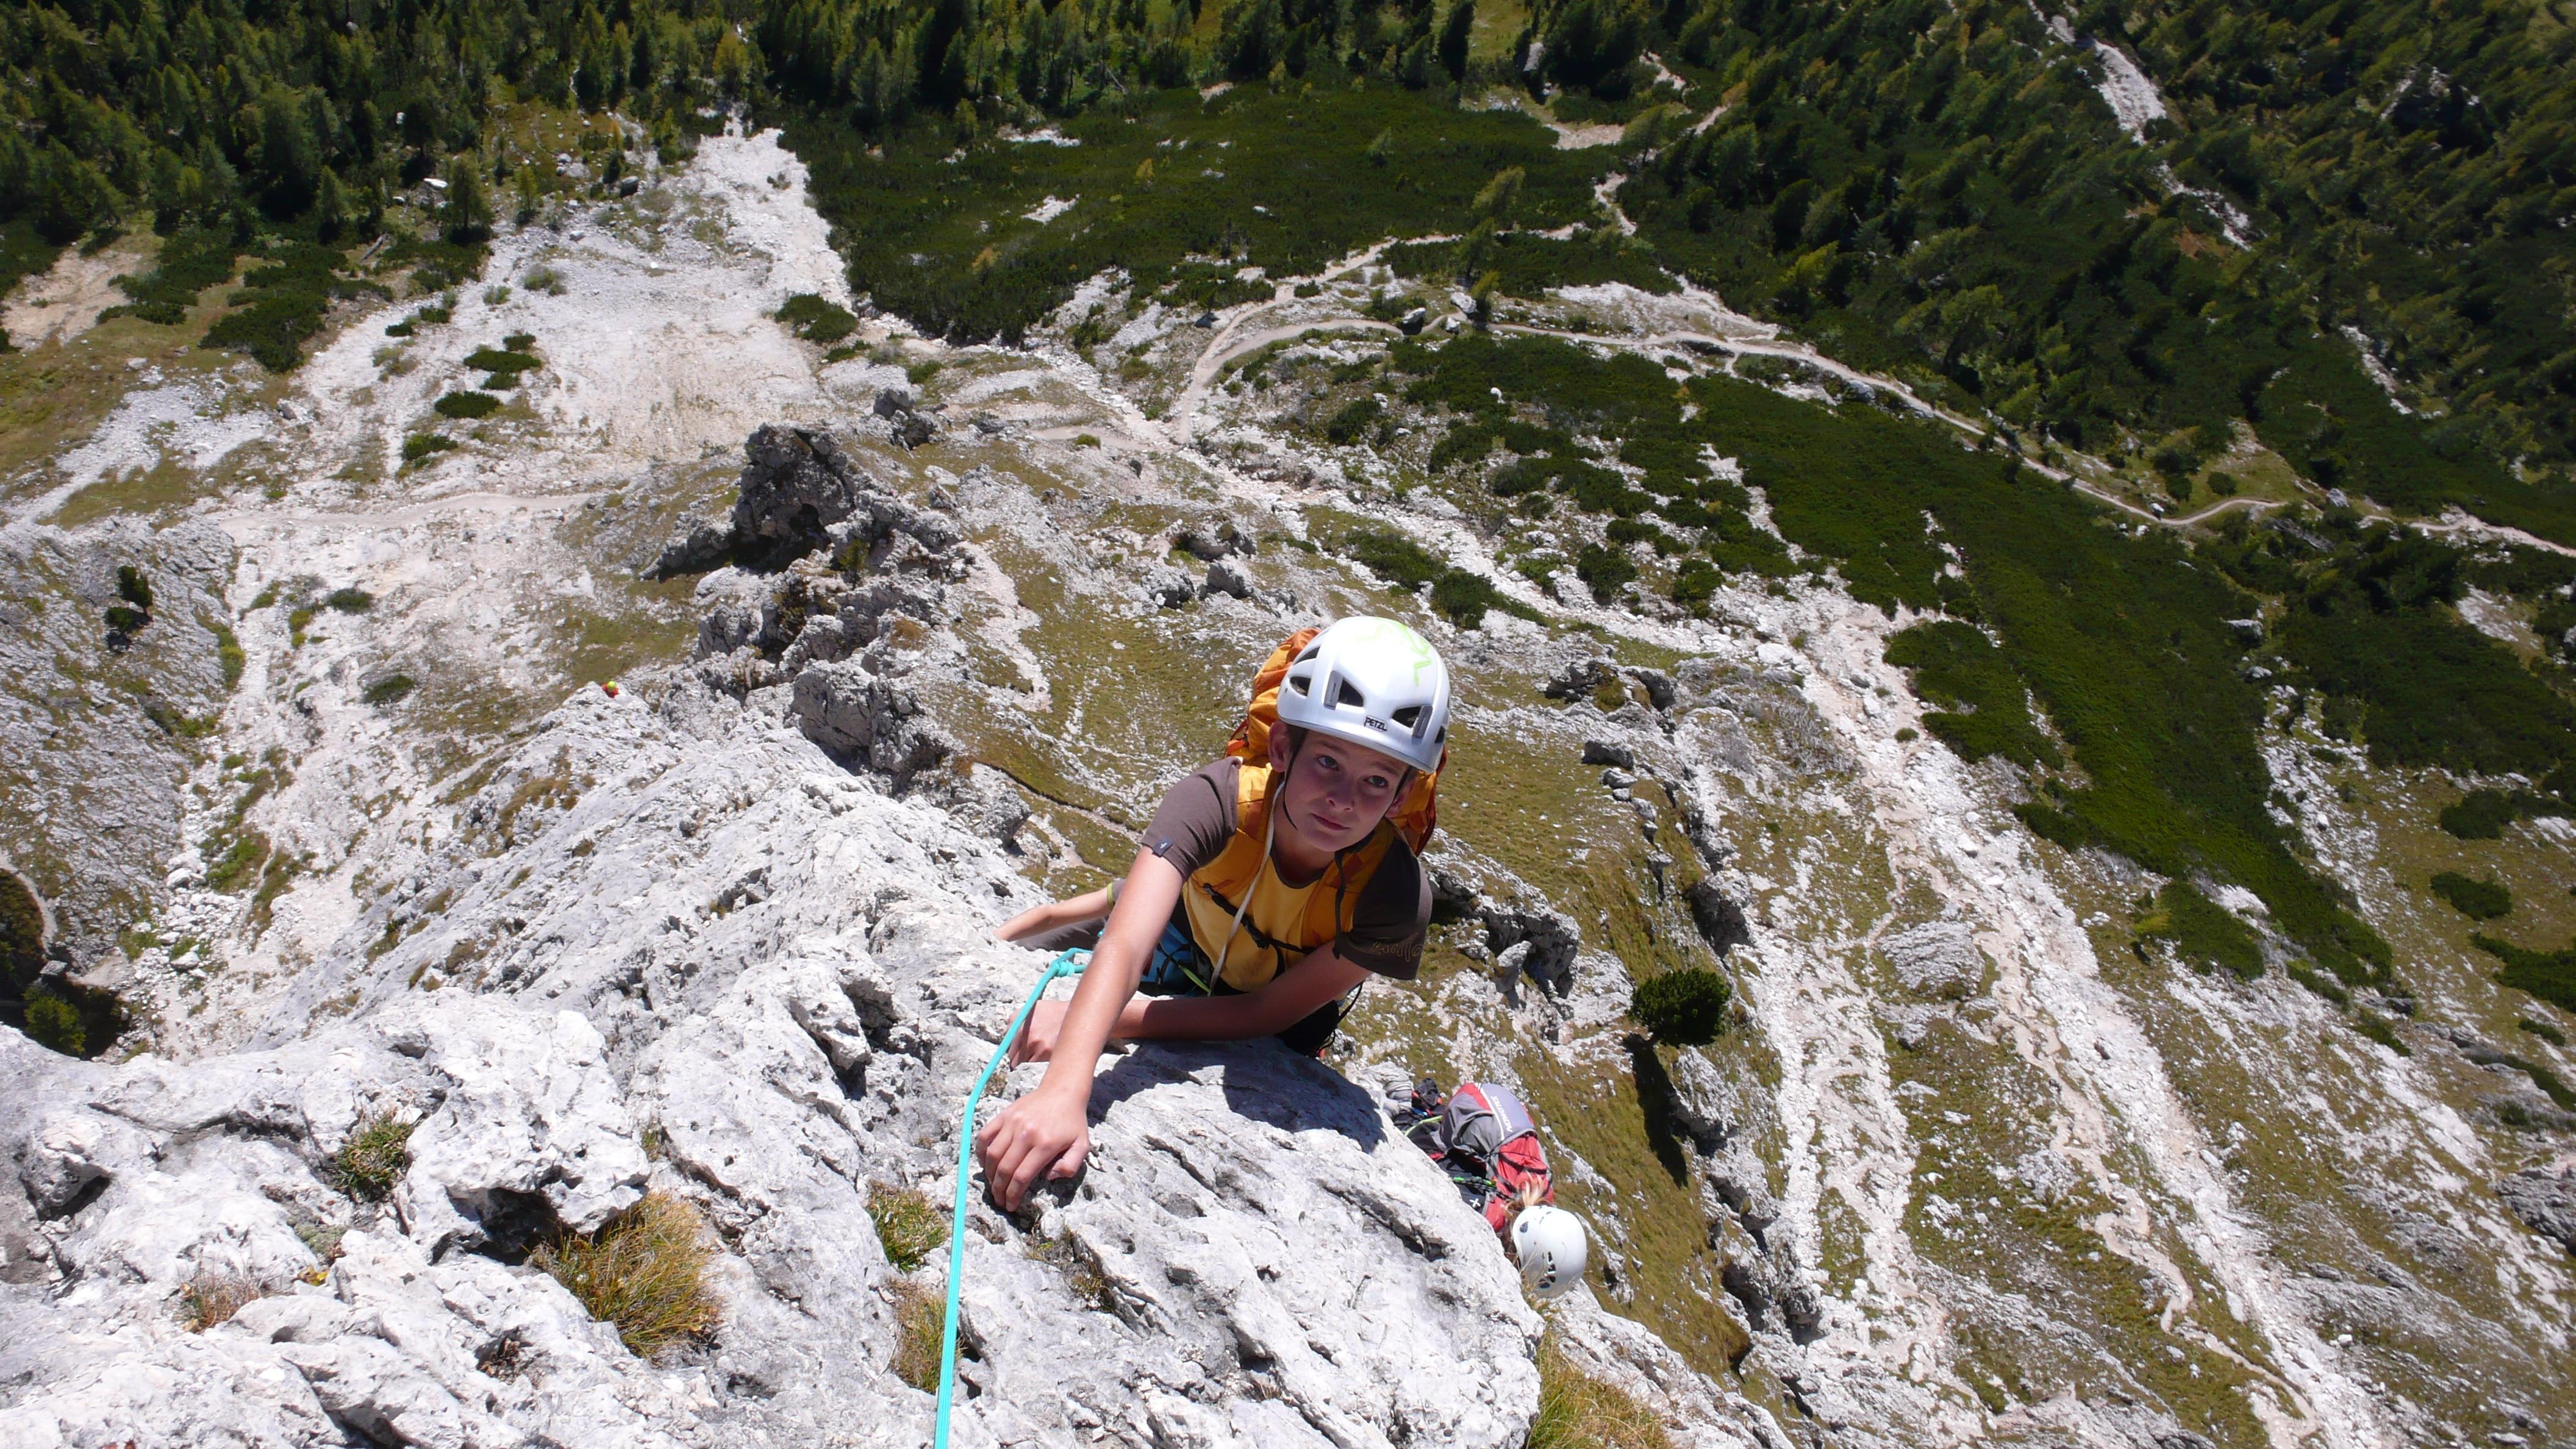 Klettergurt Kinder 4 Jahre : Klettergurte ocÚn